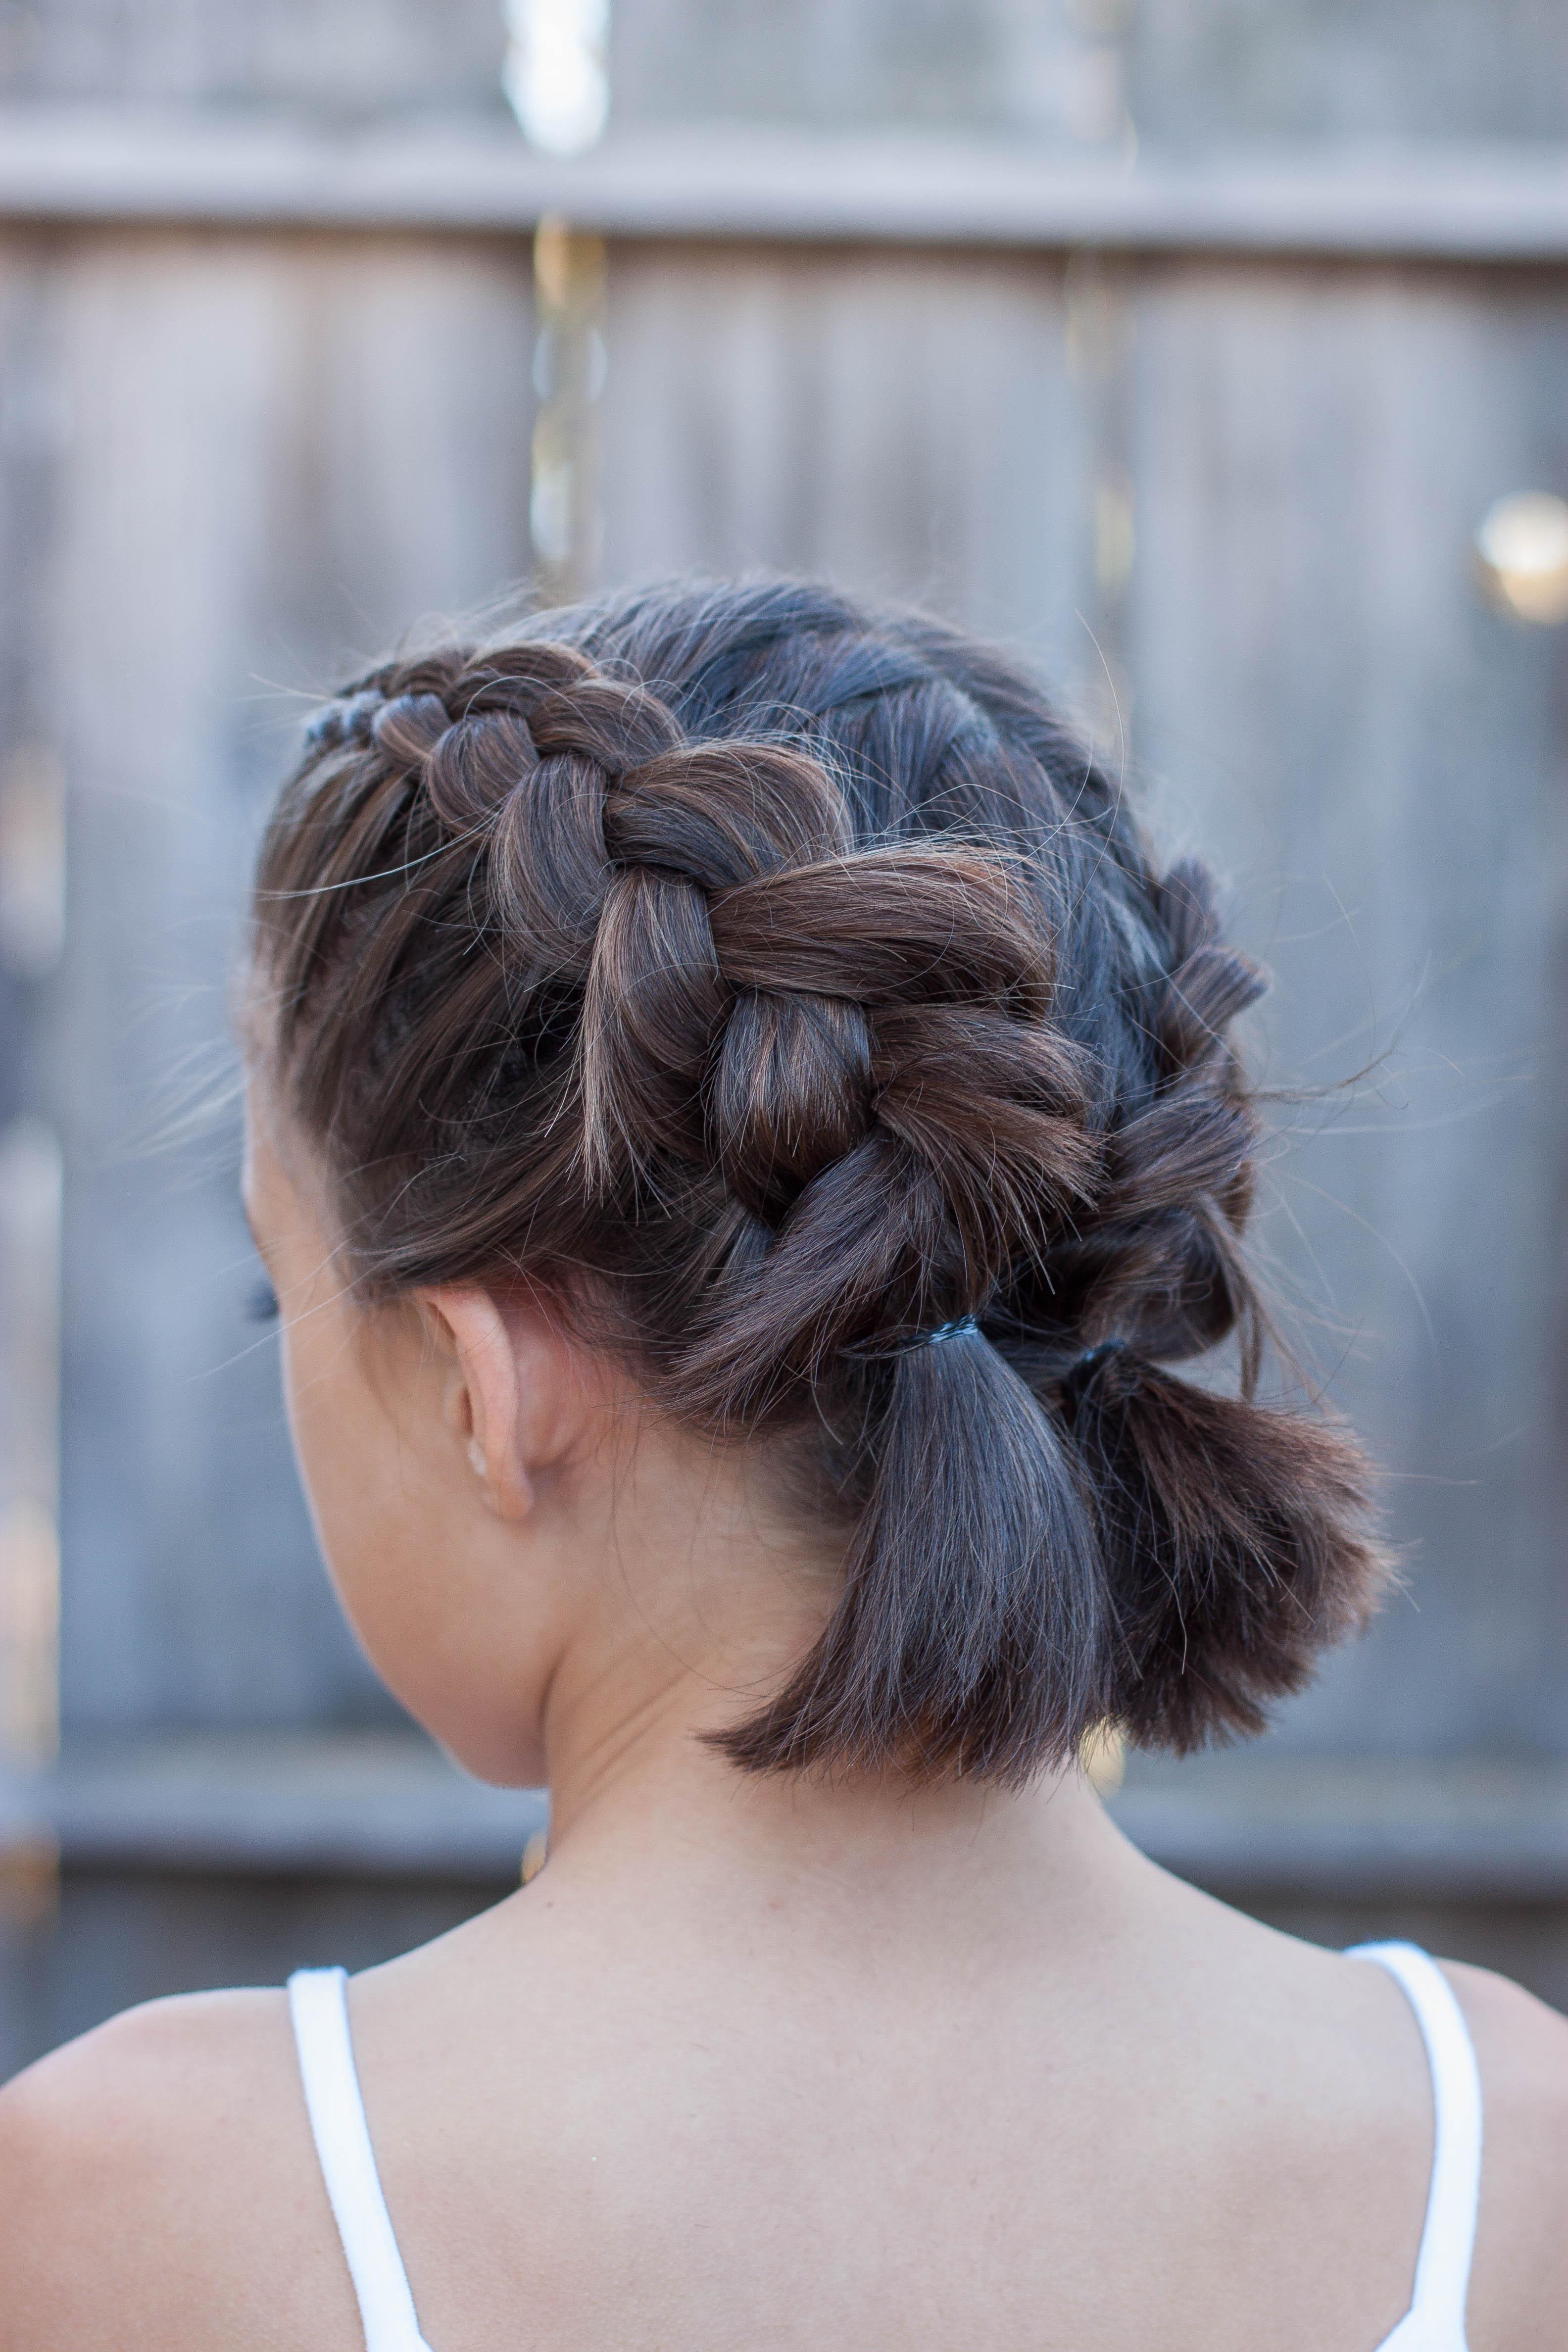 5 Braids For Short Hair | Cute Girls Hairstyles Within Cute Hairstyles For Girls With Short Hair (View 6 of 25)